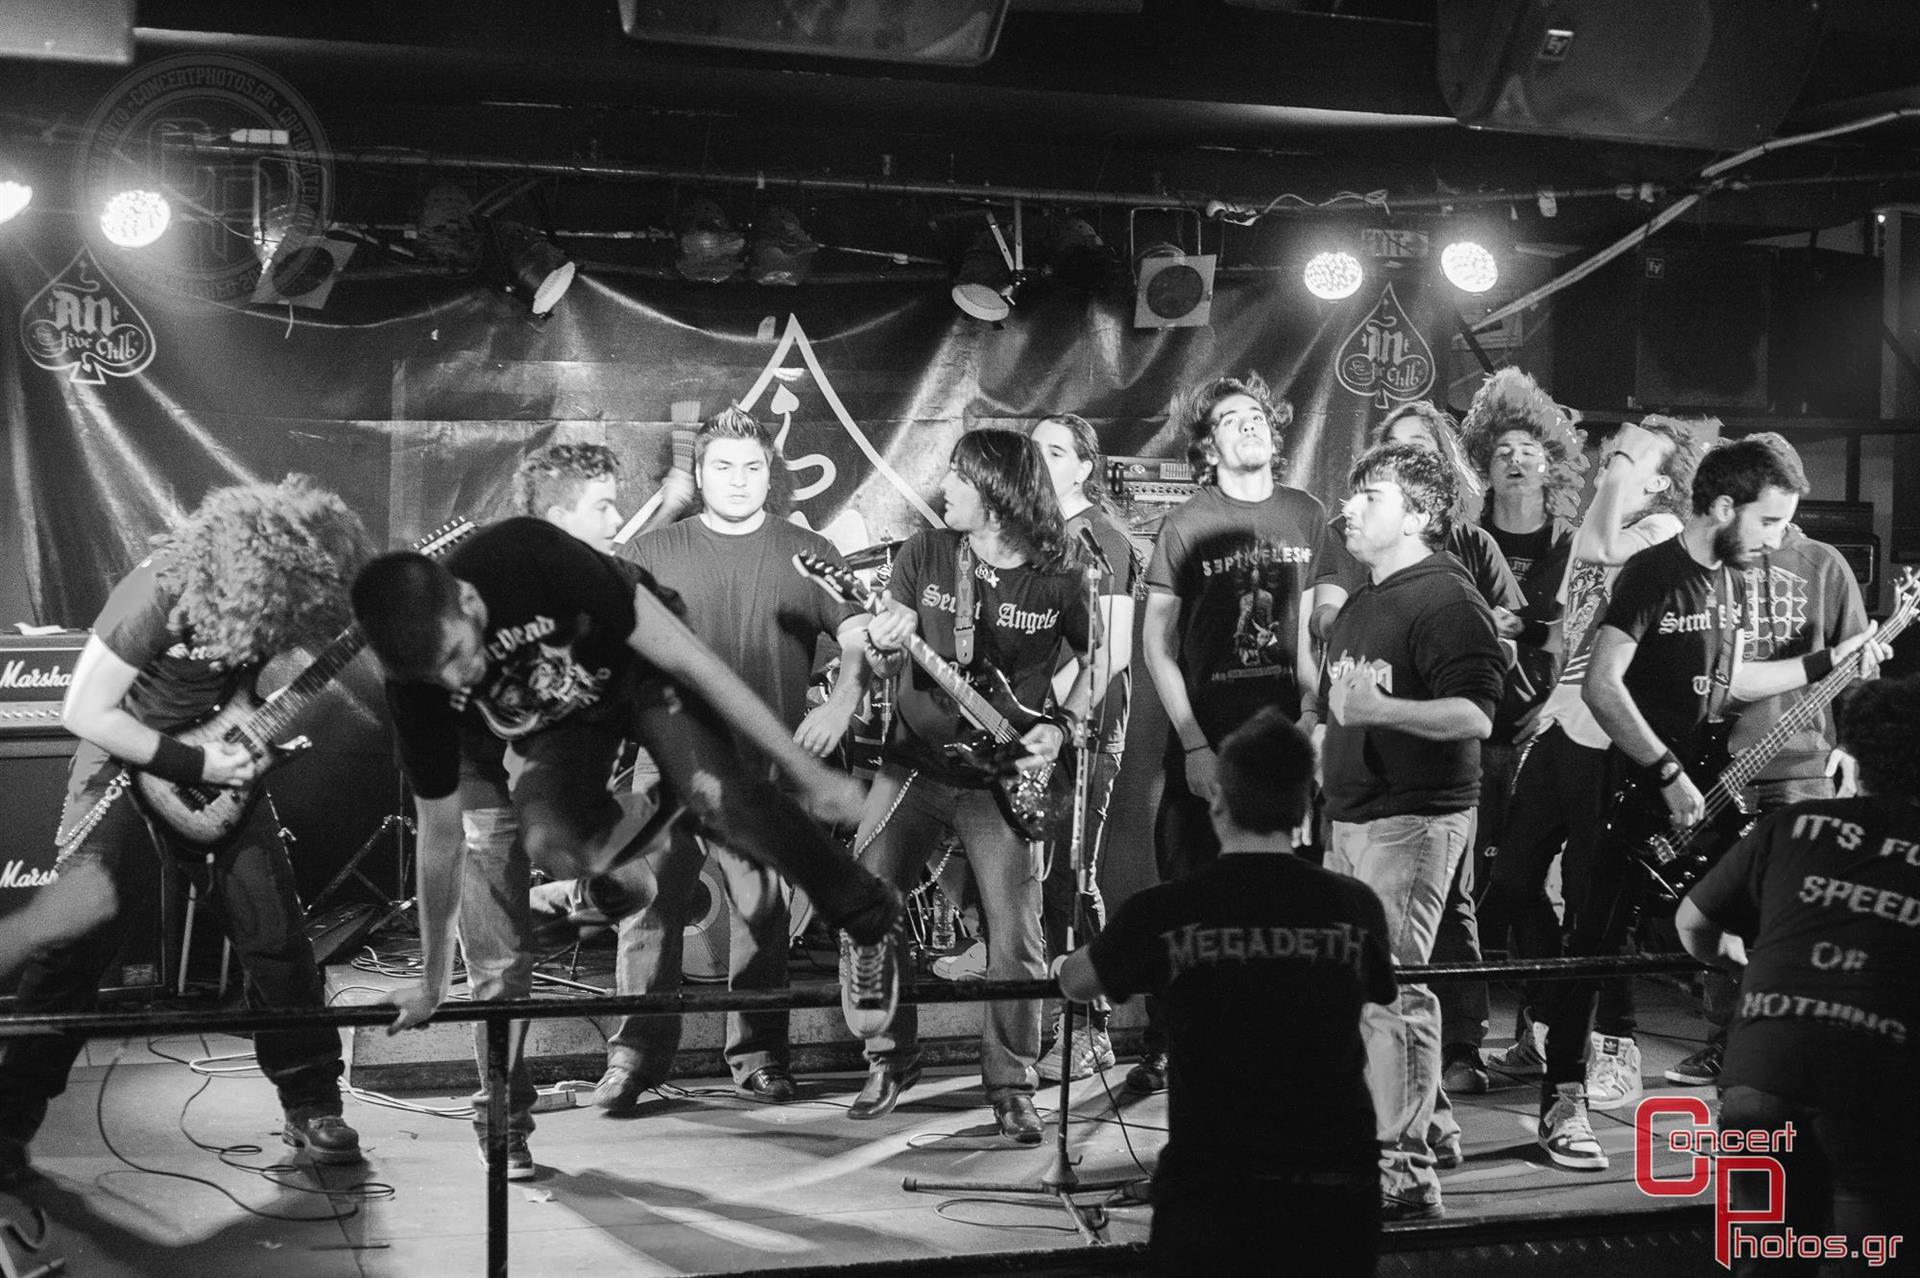 Battle Of The Bands Athens - Leg 3- photographer:  - ConcertPhotos - 20150104_2335_31